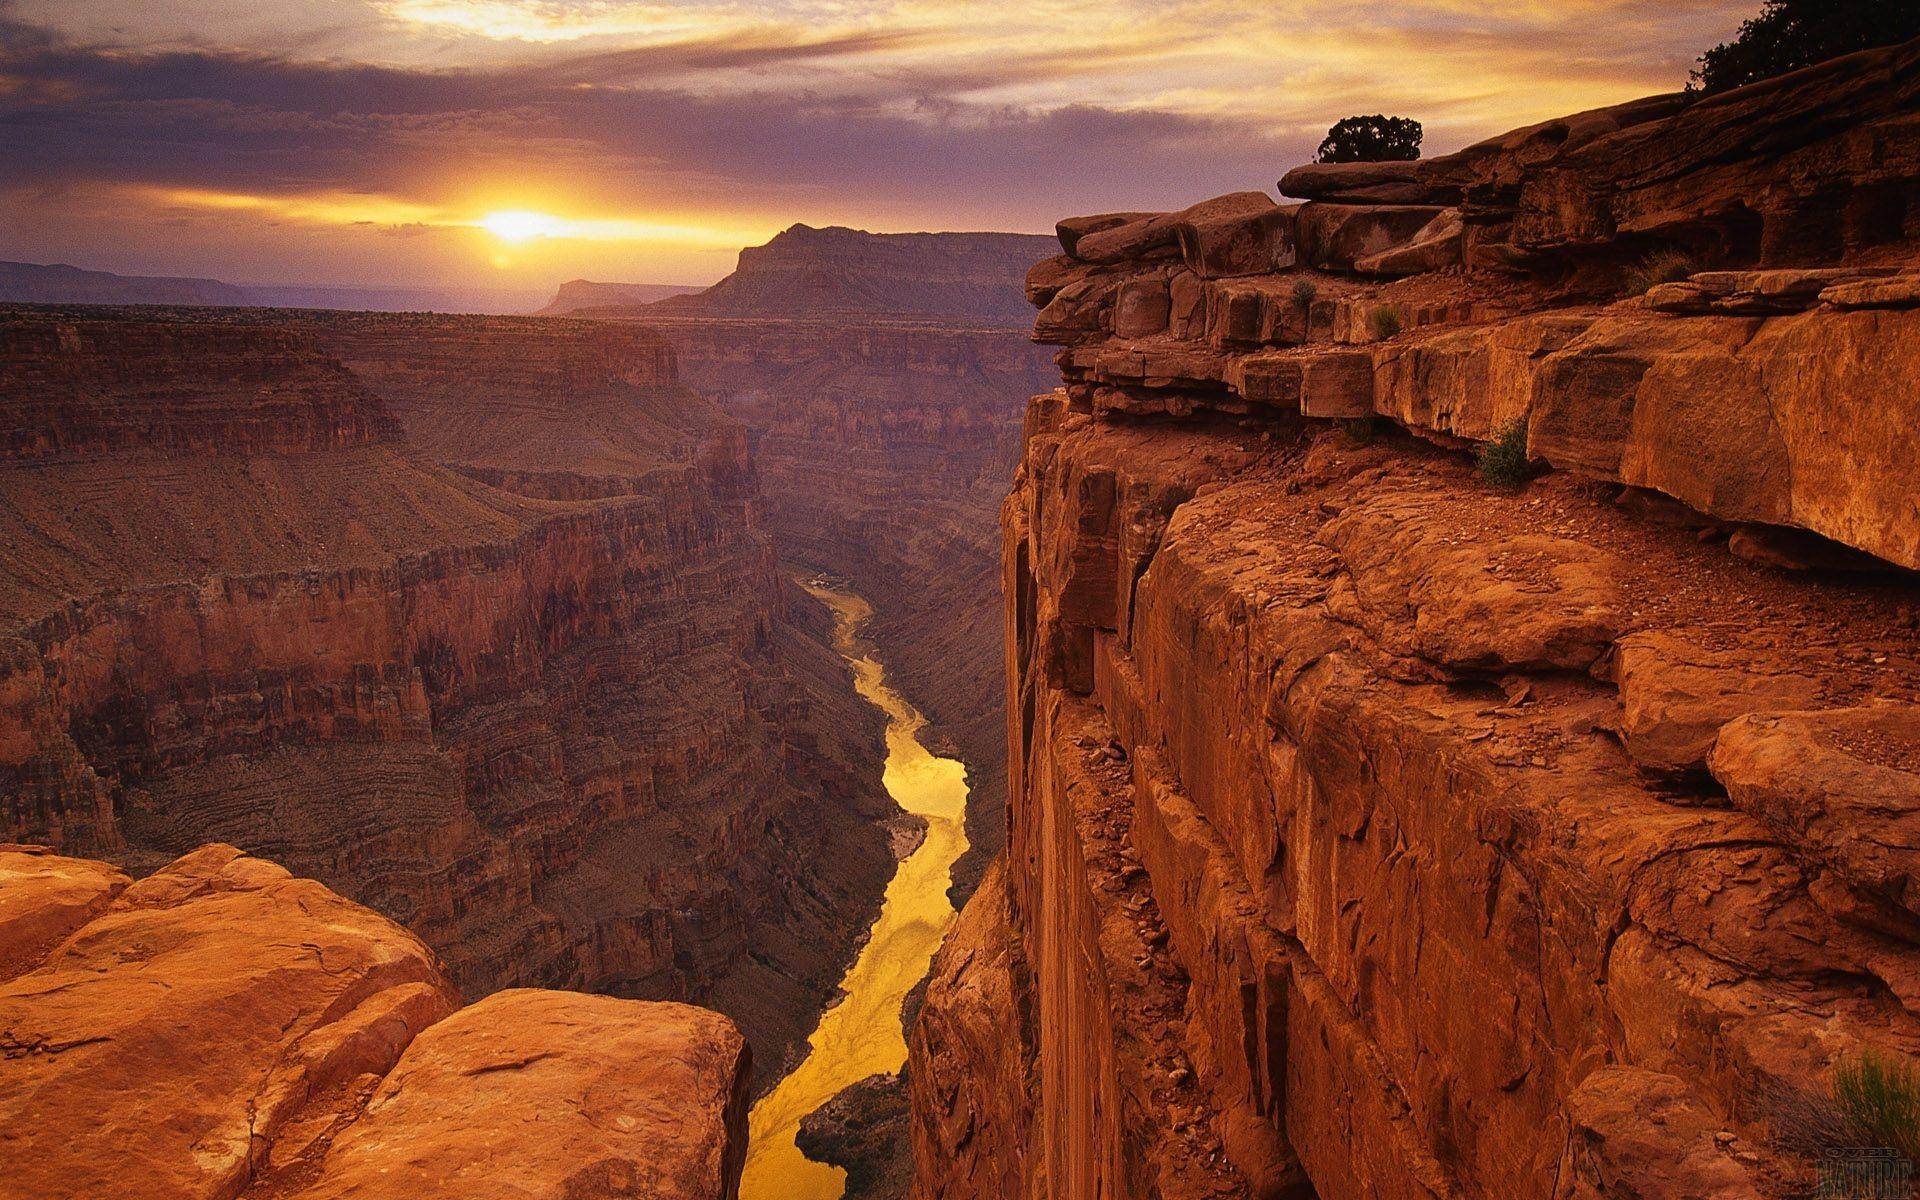 grand canyon mountain in arinzona free hd wallpapers